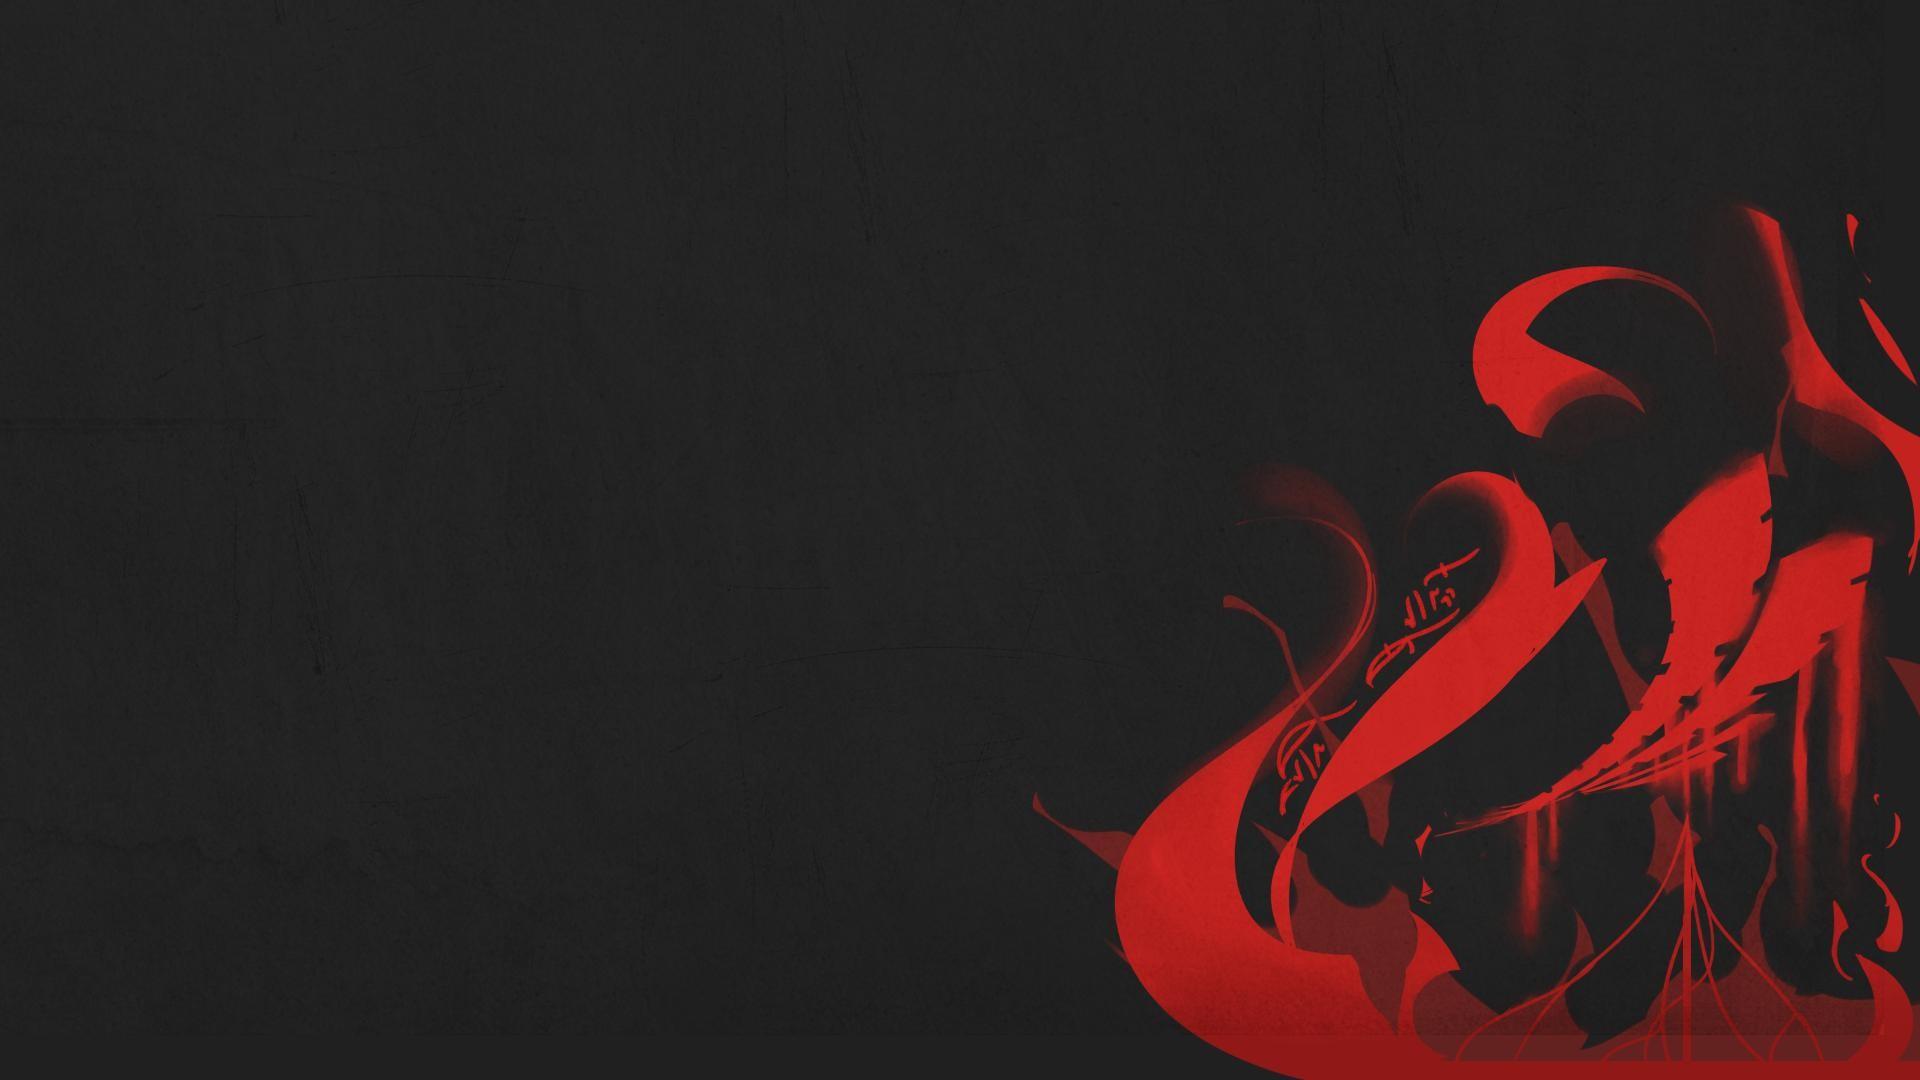 Red Veil (1920×1080) #Warframe Syndicate Wallpaper   Warframe Wallpapers    Pinterest   Wallpaper